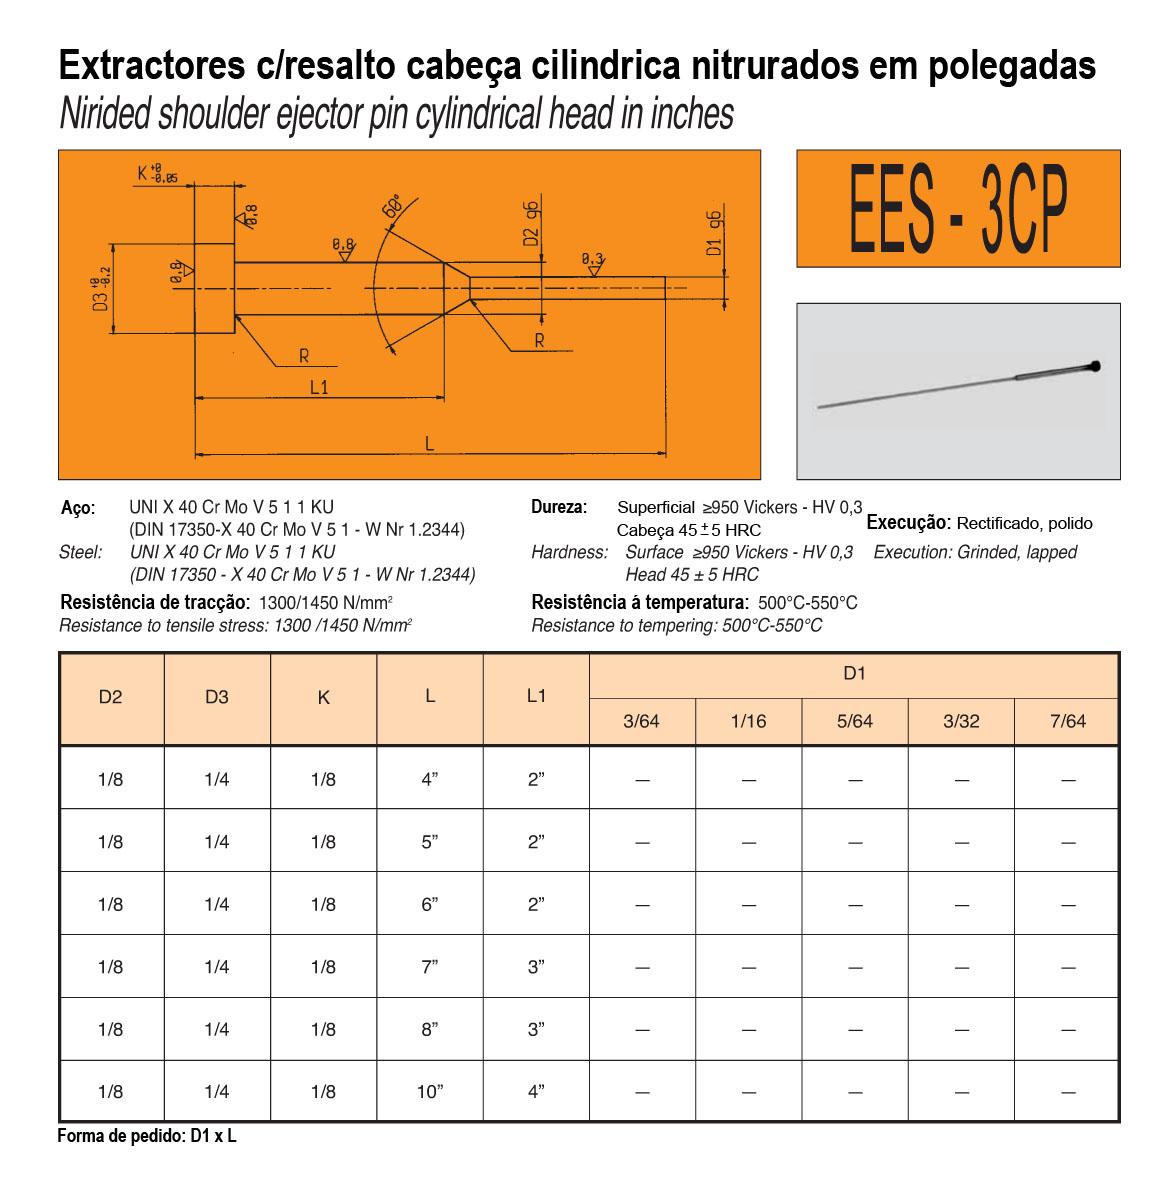 Extractores C/Resalto EES-3CP